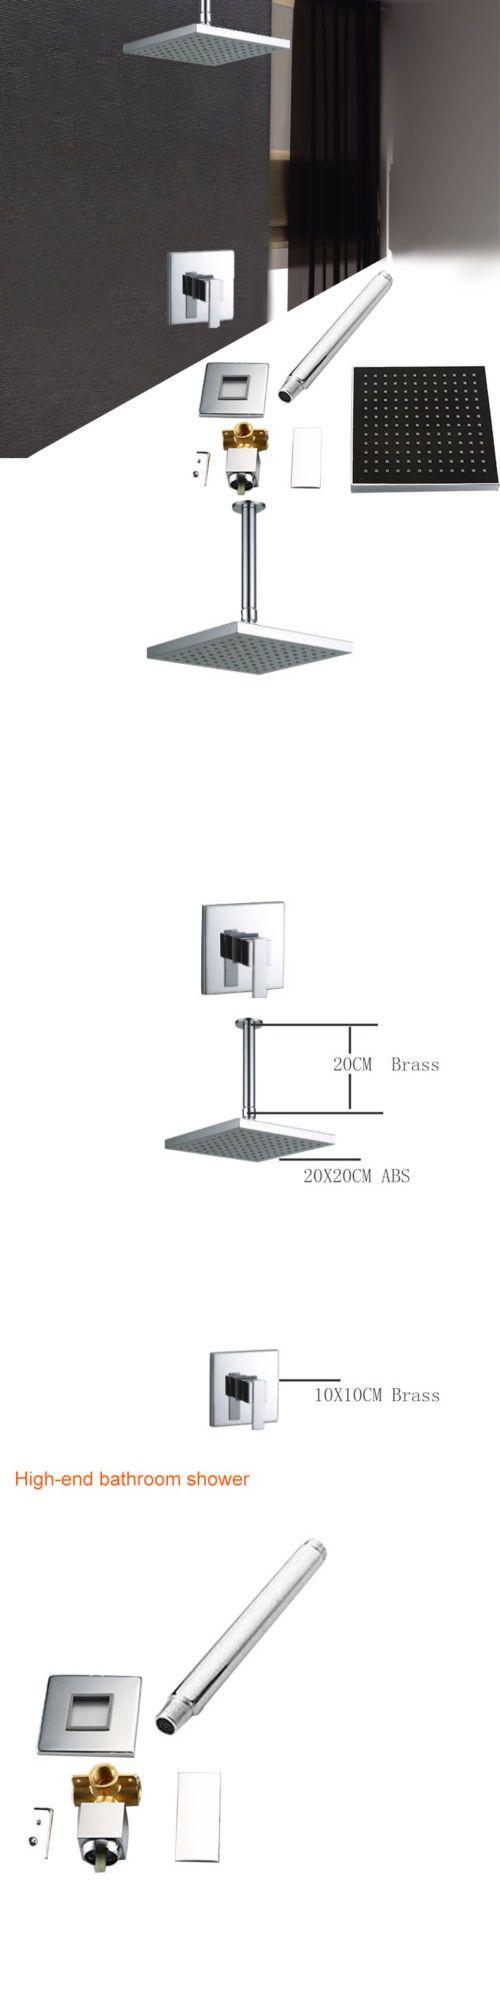 best 10 bath shower mixer taps ideas on pinterest bath shower shower heads 71282 bathroom shower faucet bath tub showerhead shower mixer tap one handle